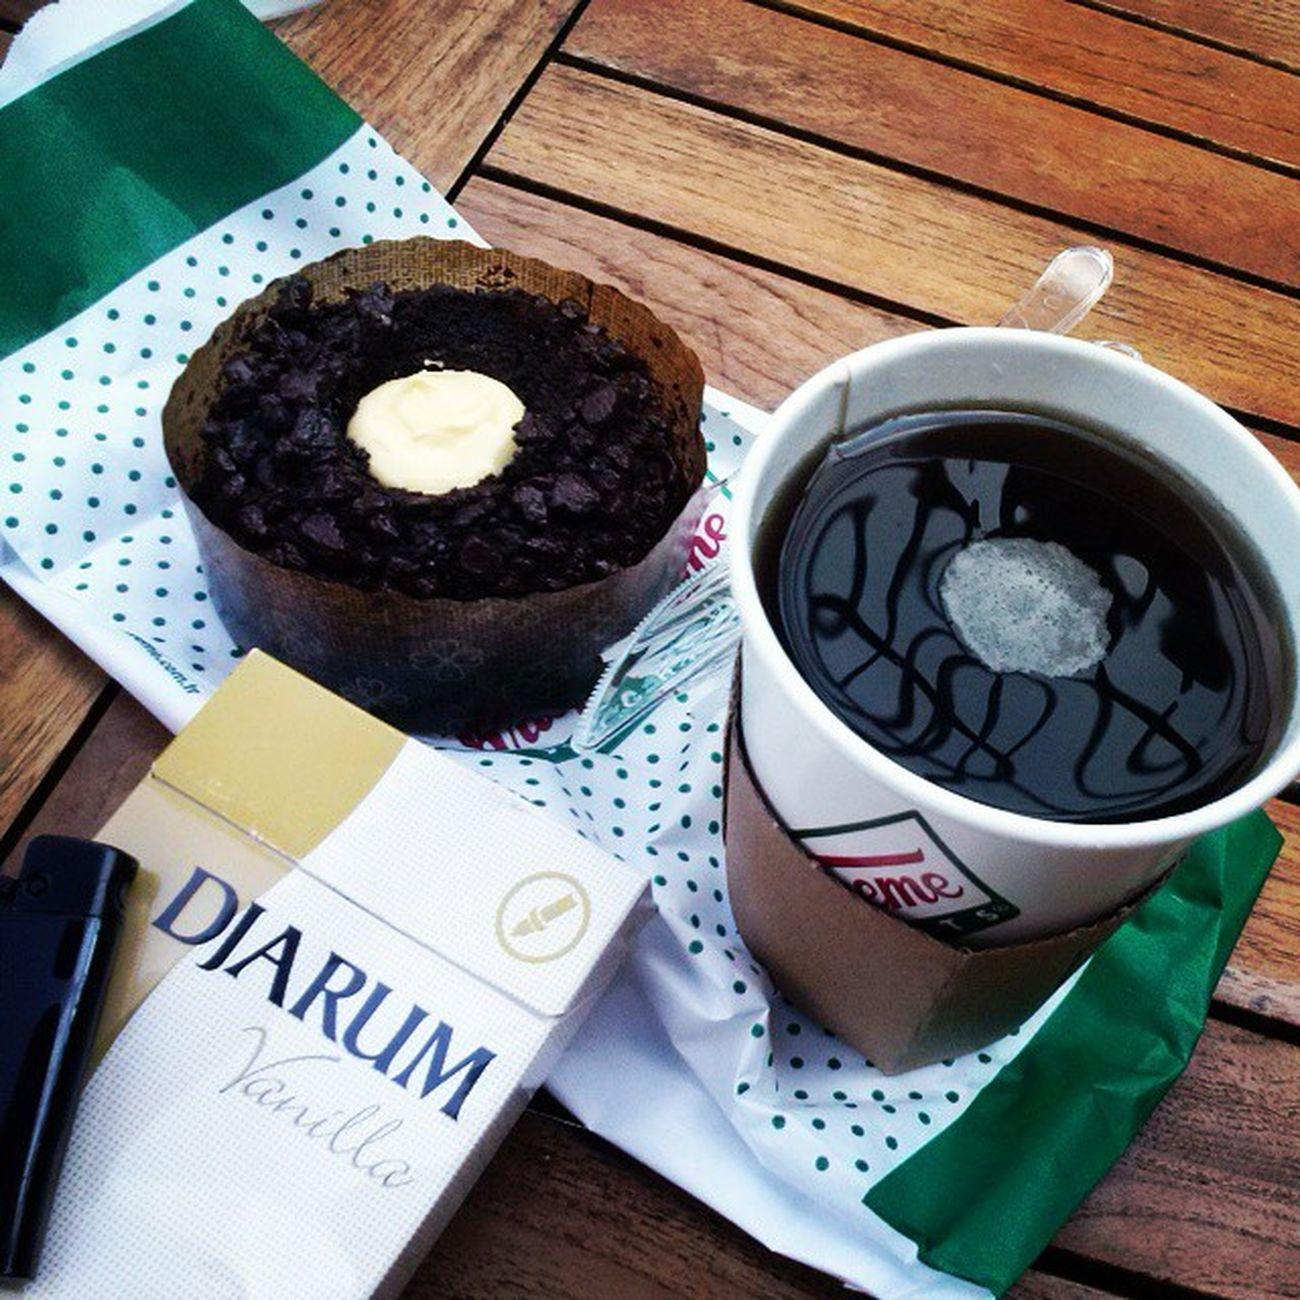 Kruffin candir can. çay Tea Kruffin Krispy djarum vanilla instagood instaturkey kozzy